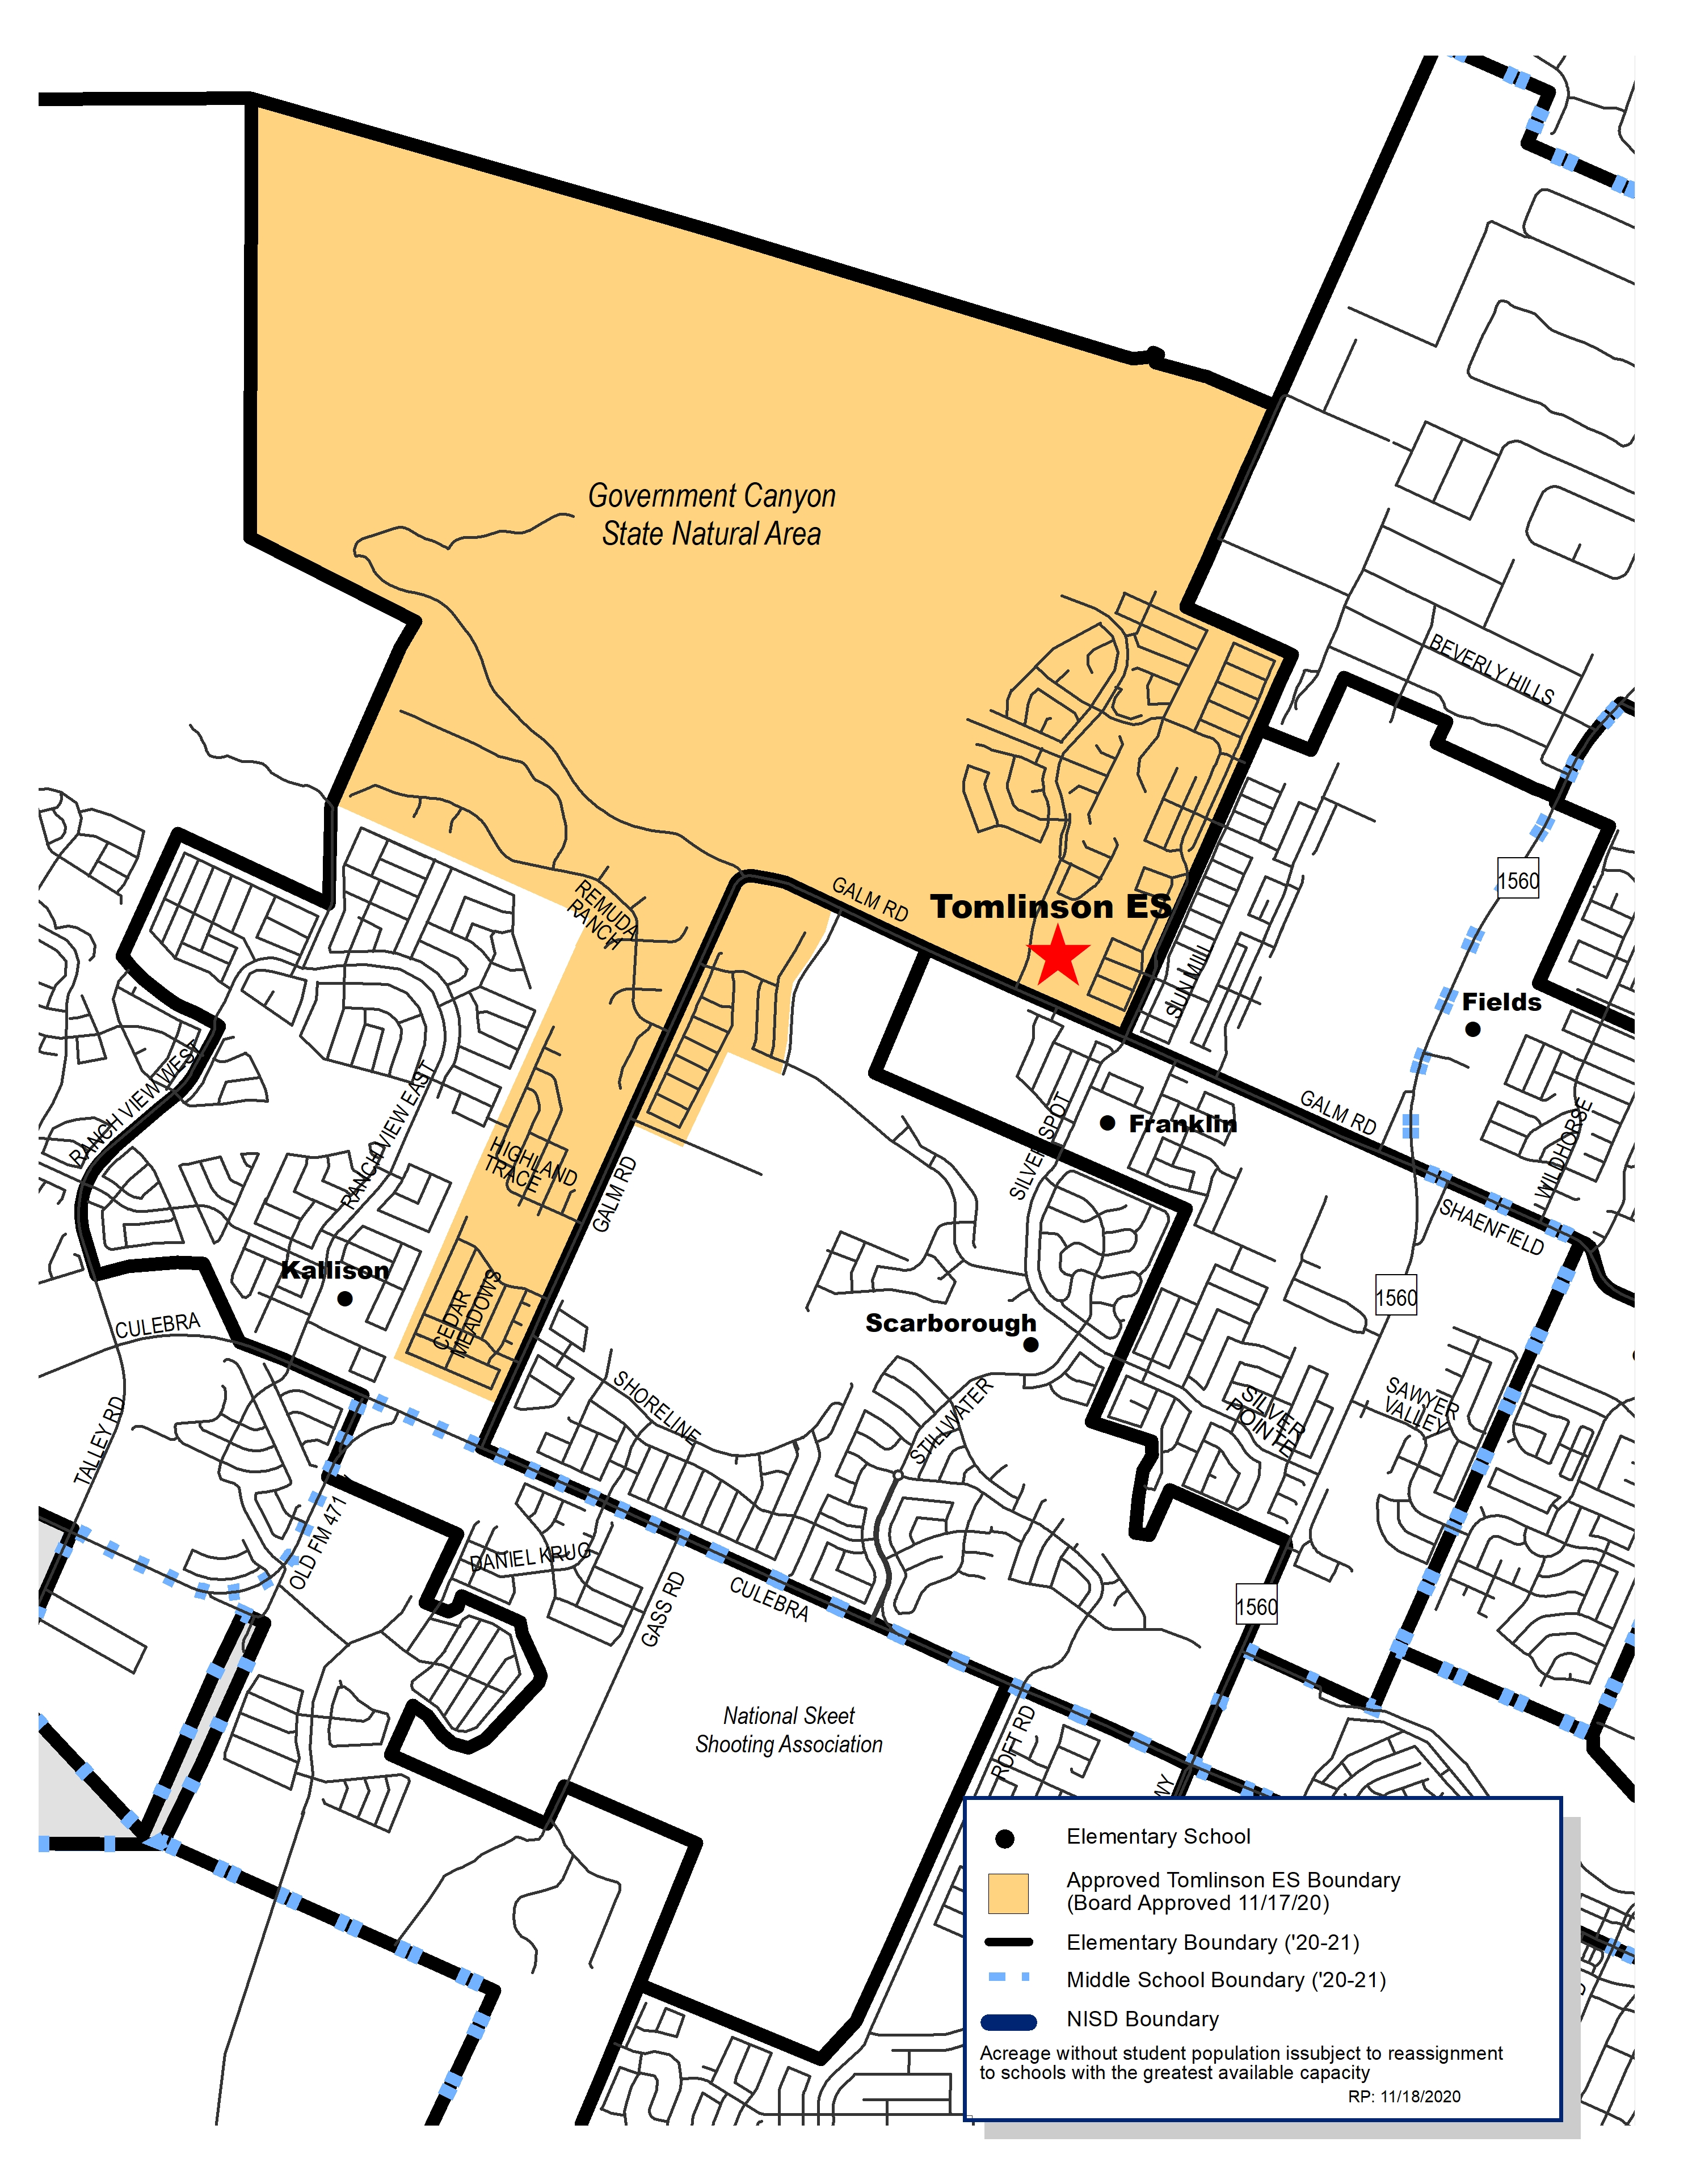 Nisd Calendar 2021-22 Tomlinson Elementary School opens in 2021 22   Tomlinson